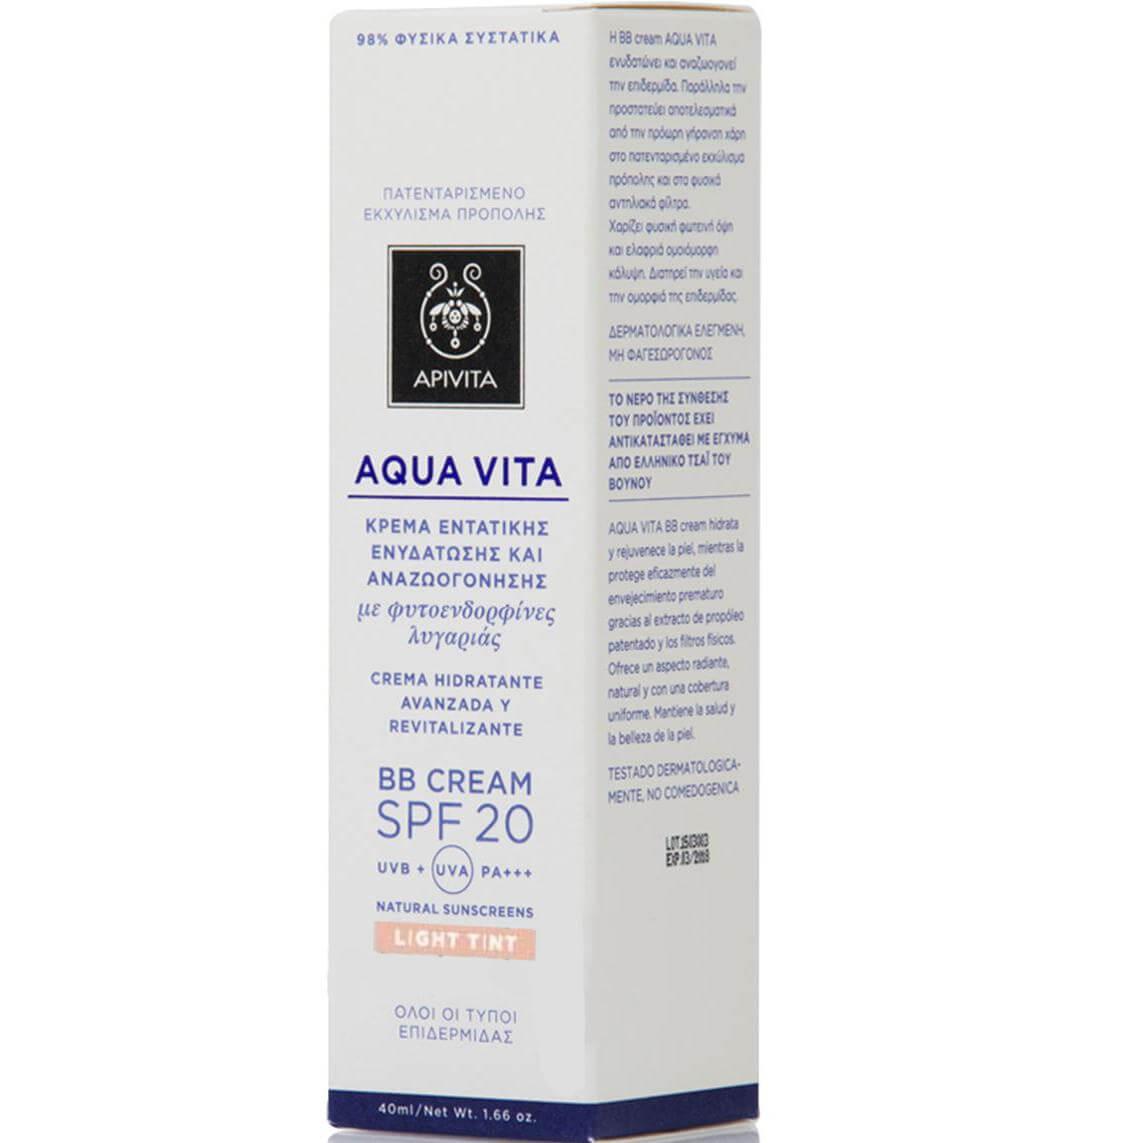 Apivita Aqua Vita BB Cream Light Ενυδατώνει και Αναζωογονεί την Επιδερμίδα Spf20 40ml